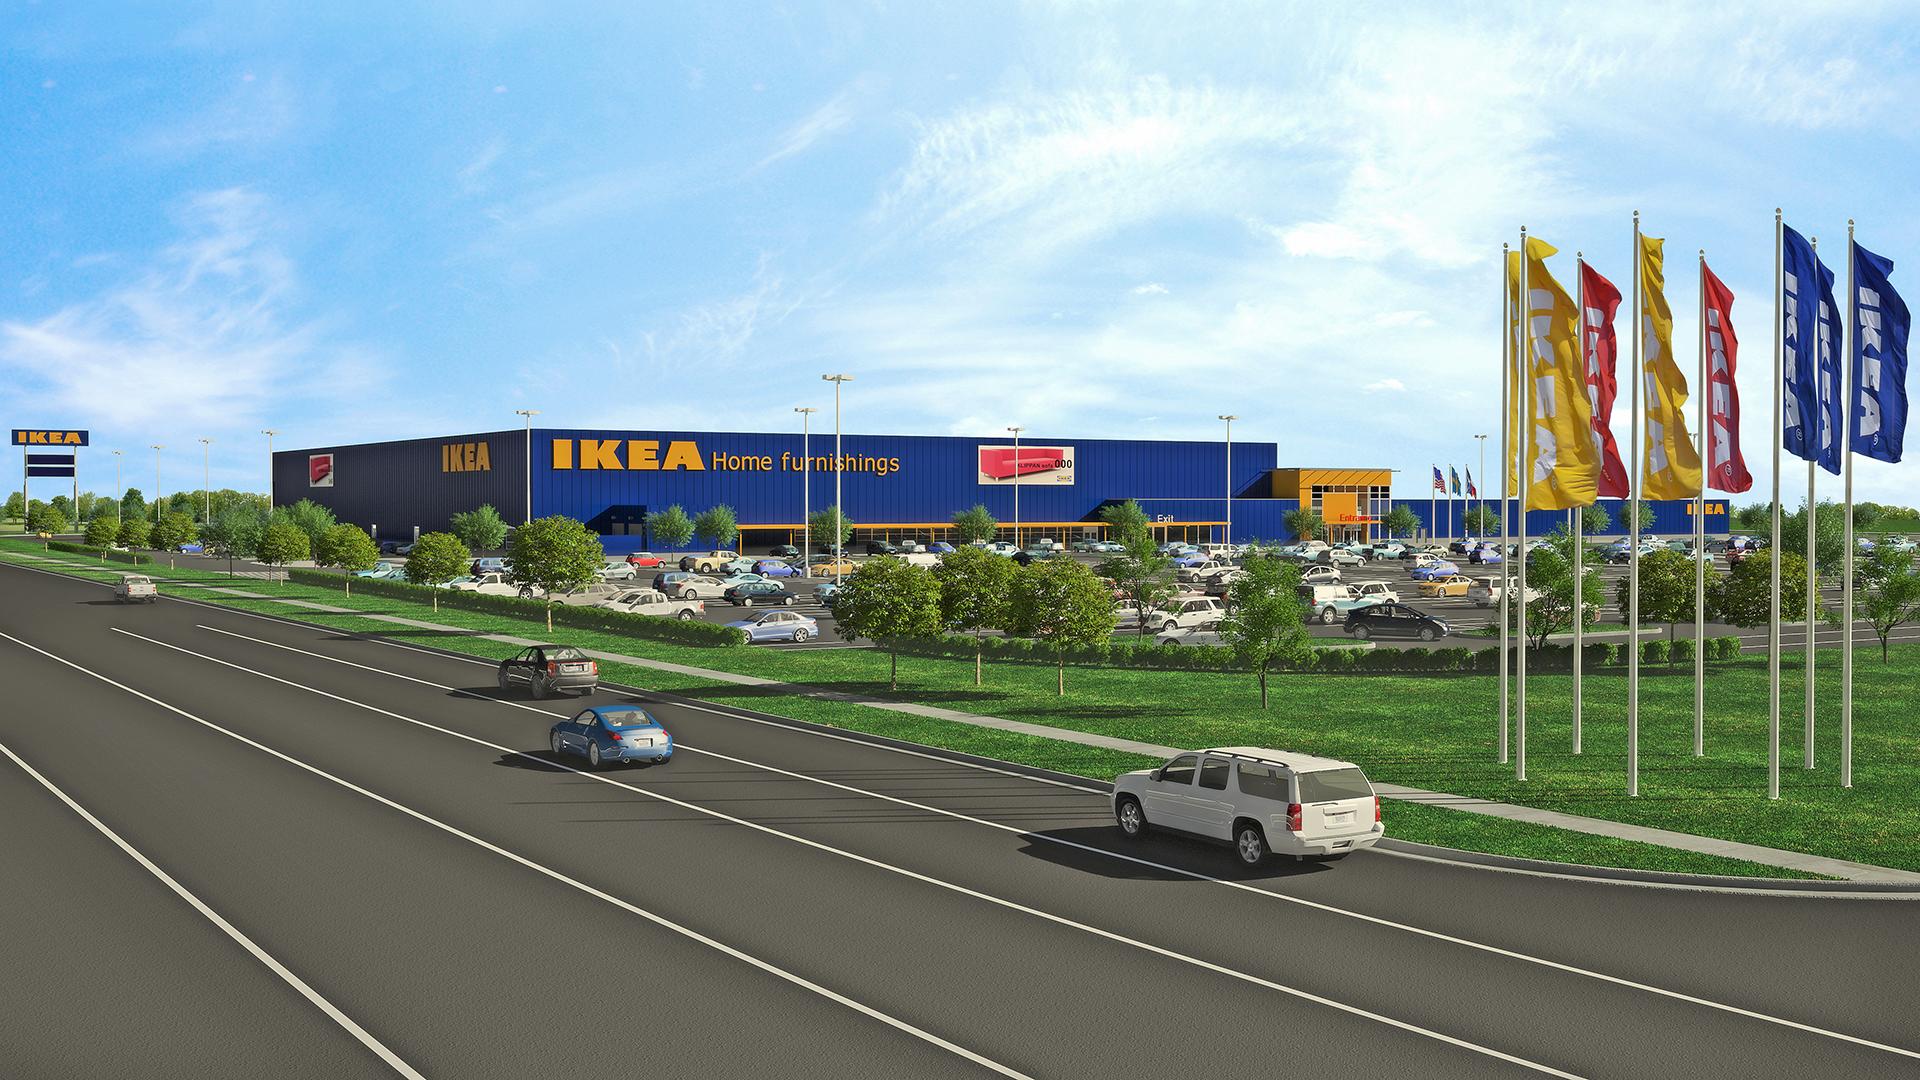 Ikea grand prairie to open its doors in december for Ikea i 10 houston tx